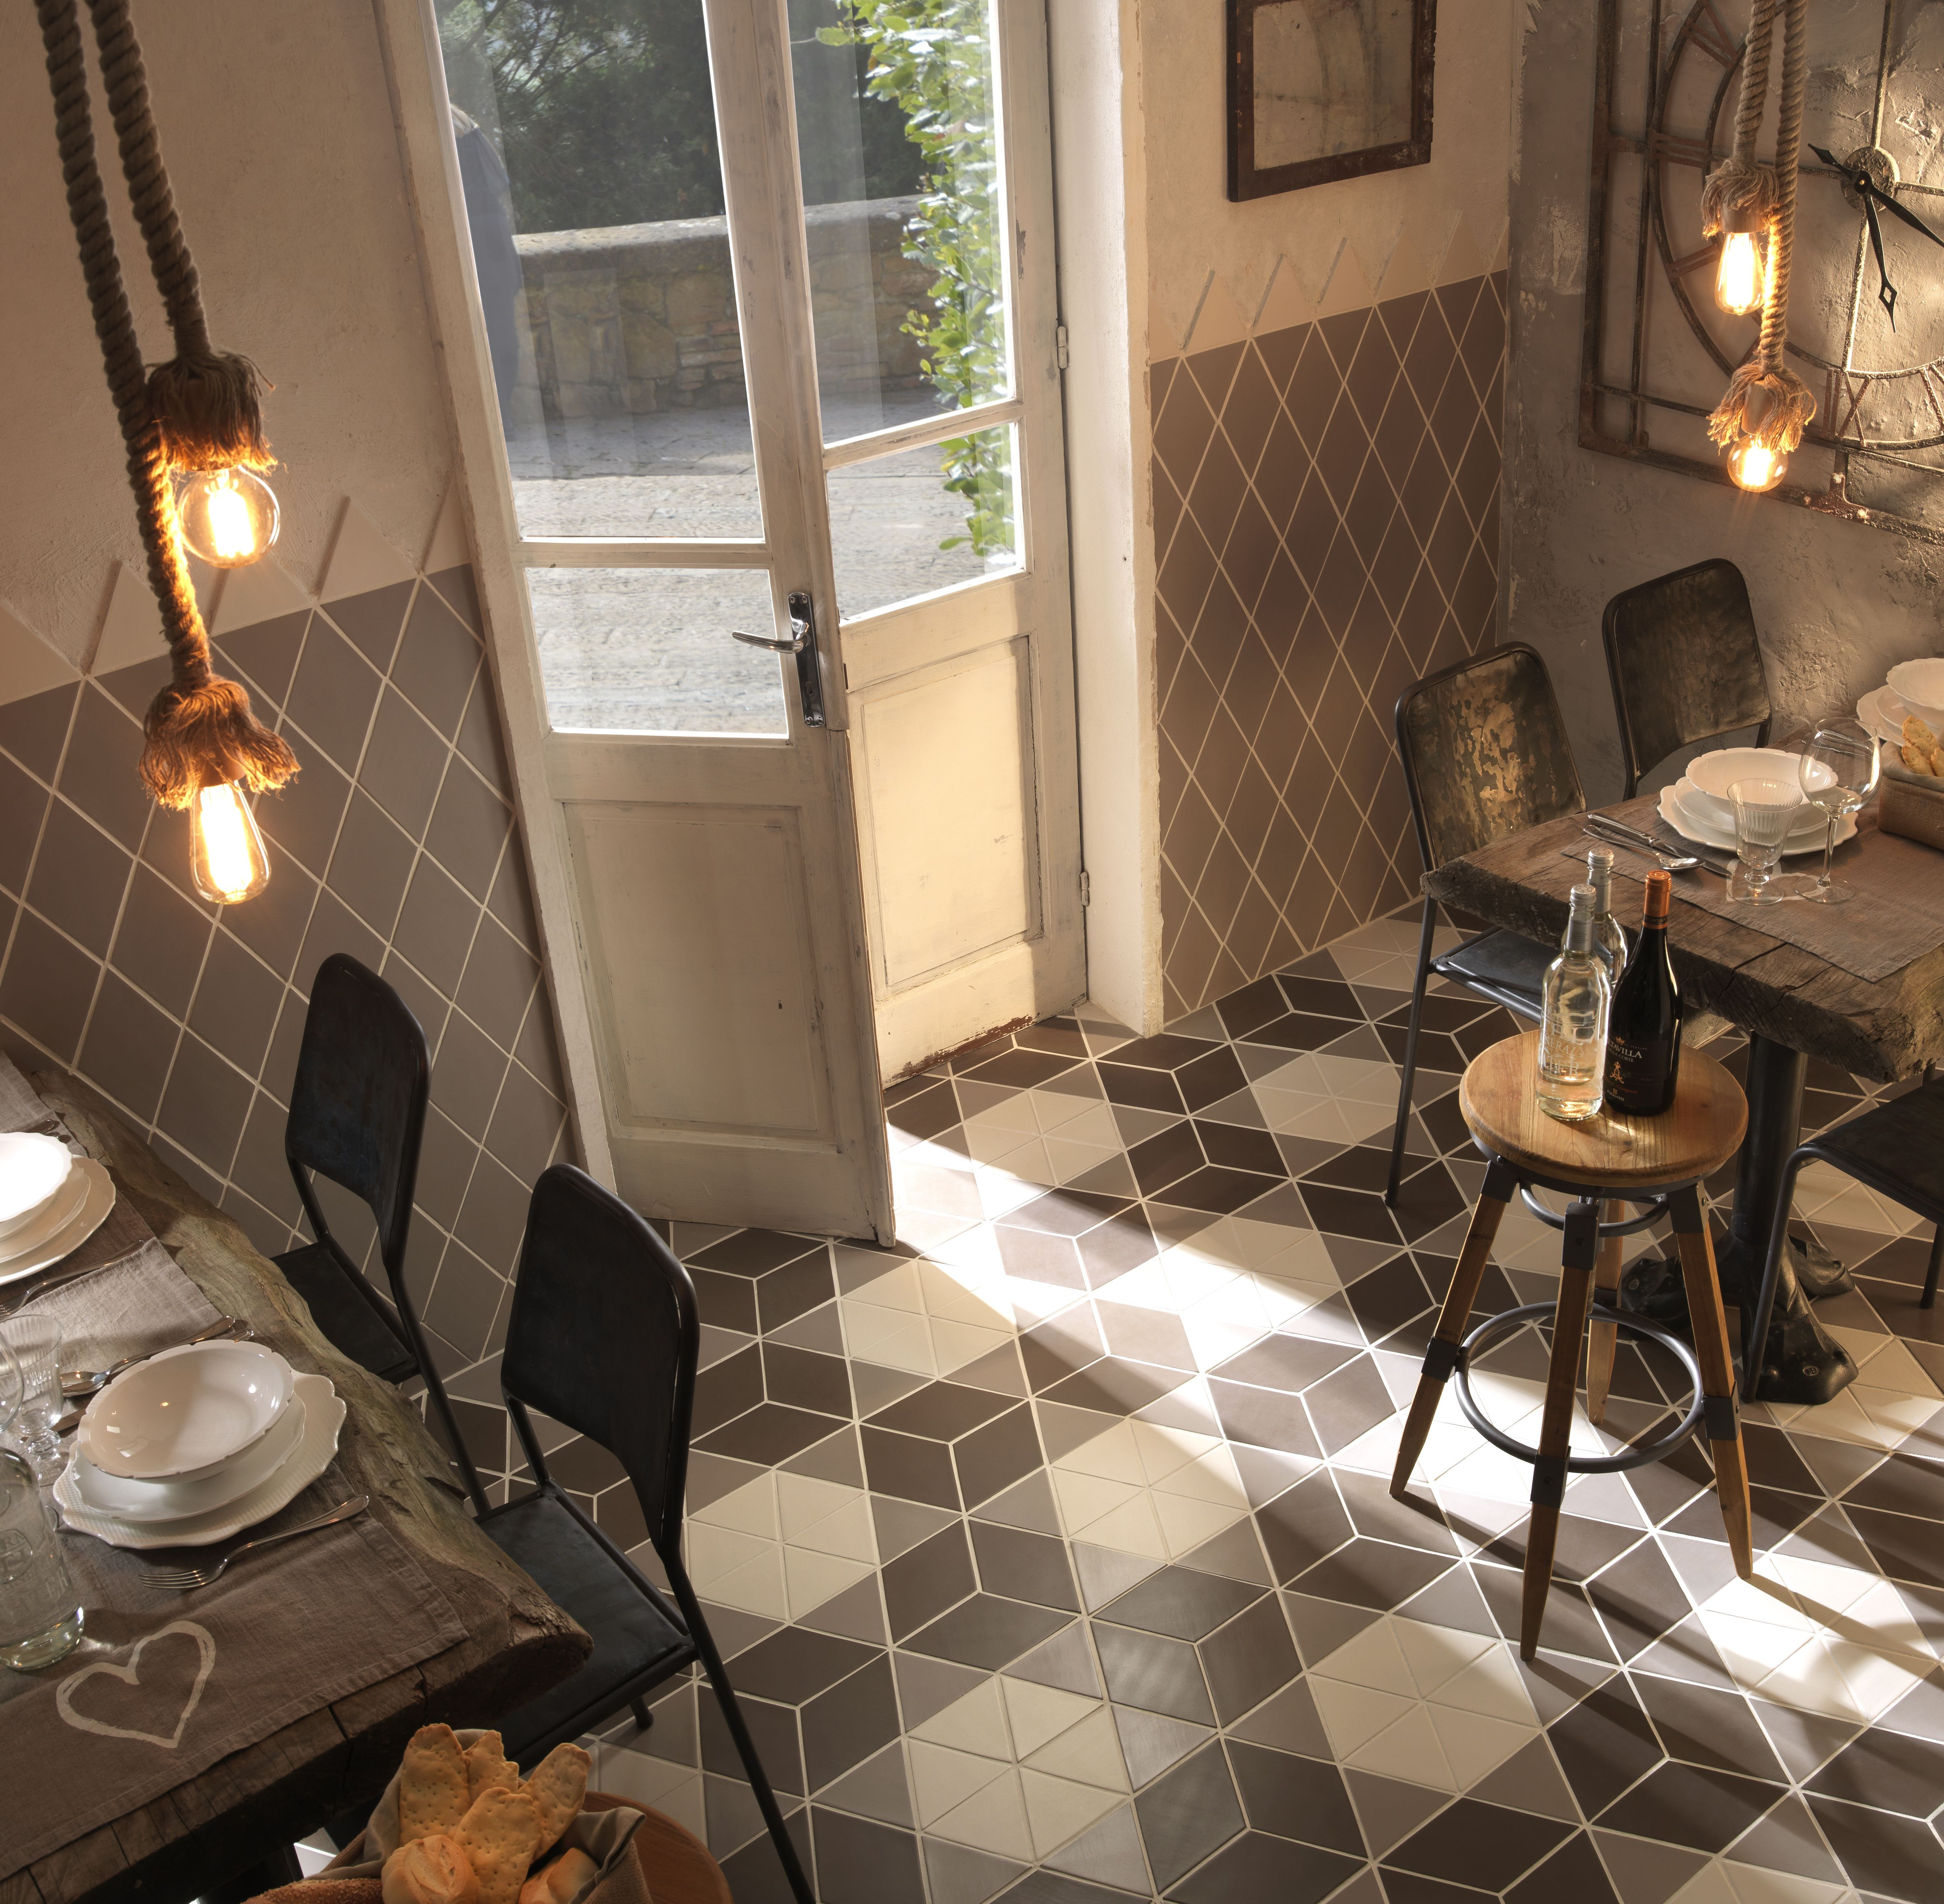 Vanite Salle De Bain Ciot ~ tonalite collezione geomat forma rhombus tiles piastrelle shape